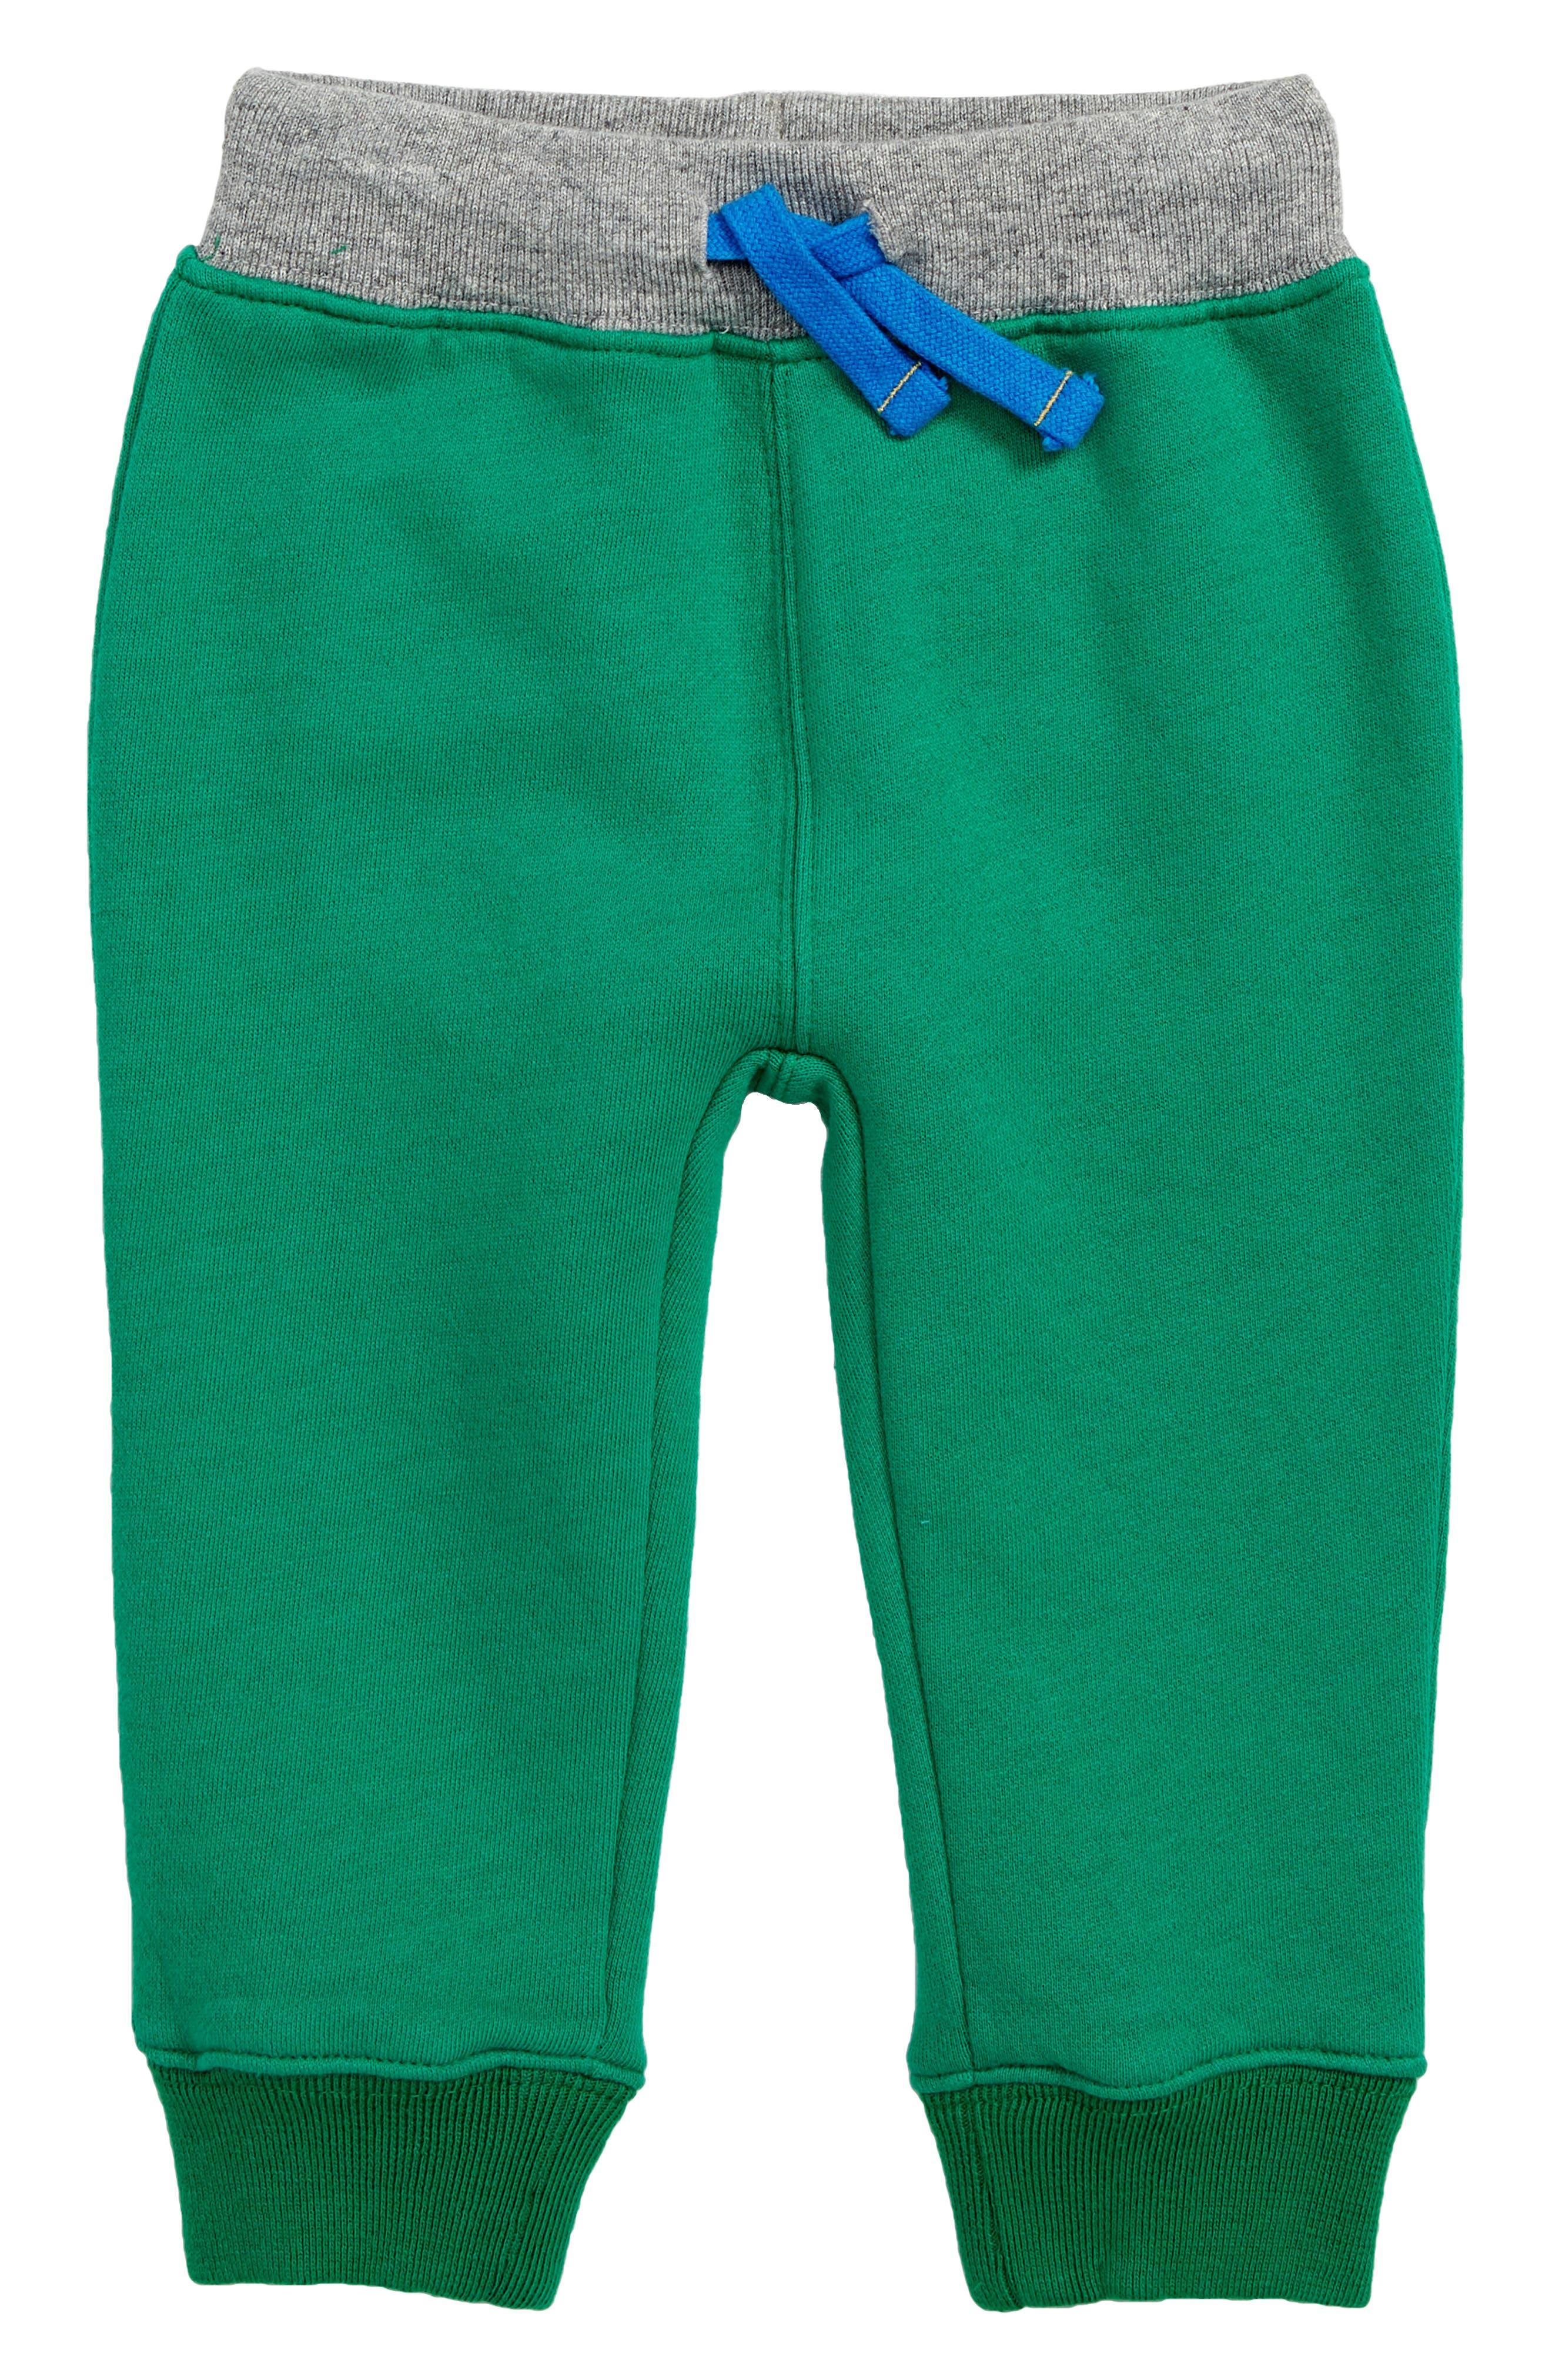 Toddler Boys Mini Boden Novelty Applique Sweatpants Size 34Y  Grey